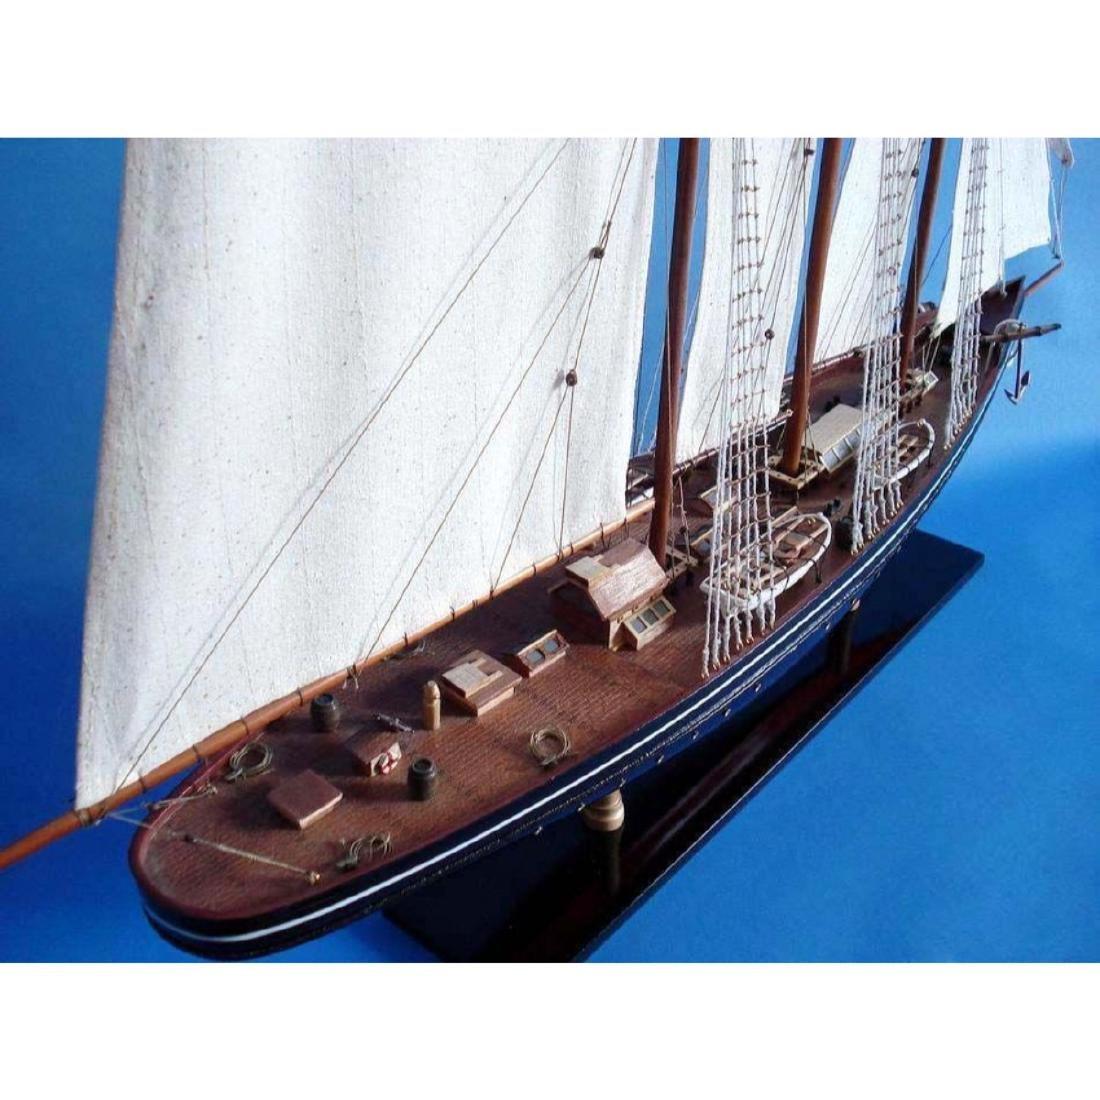 "Wooden Atlantic Limited Model Sailboat 32"" - 2"